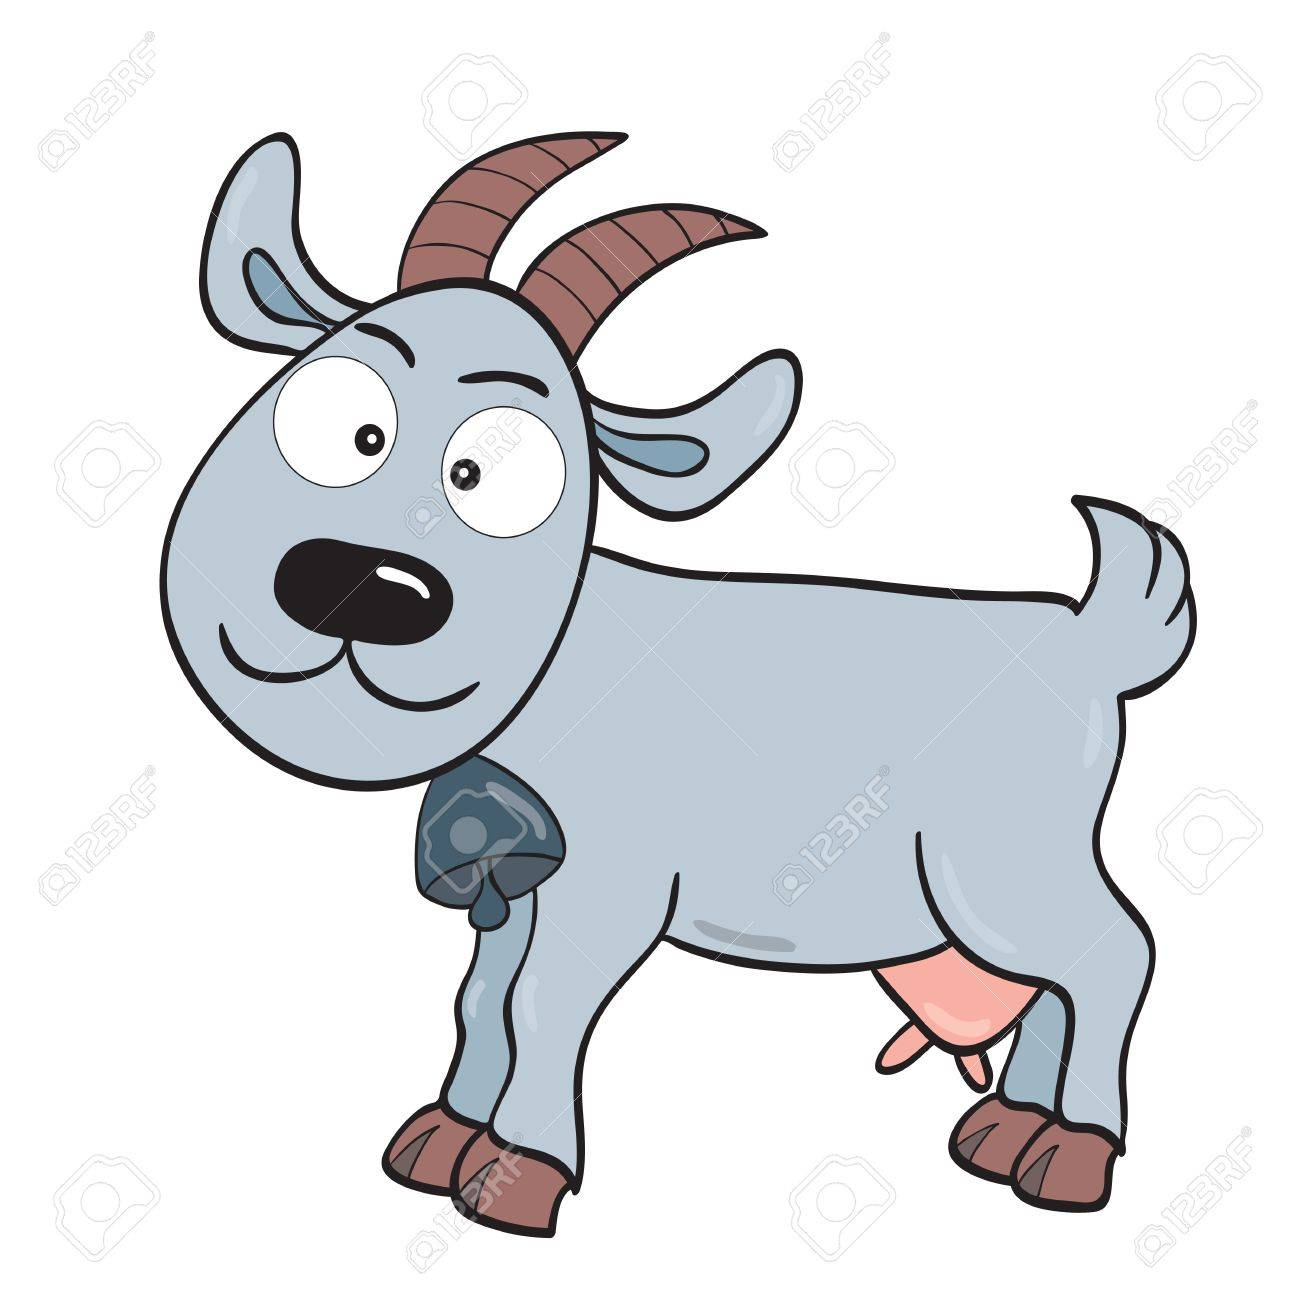 illustration of smiling cute cartoon goat. Stock Vector - 14744170